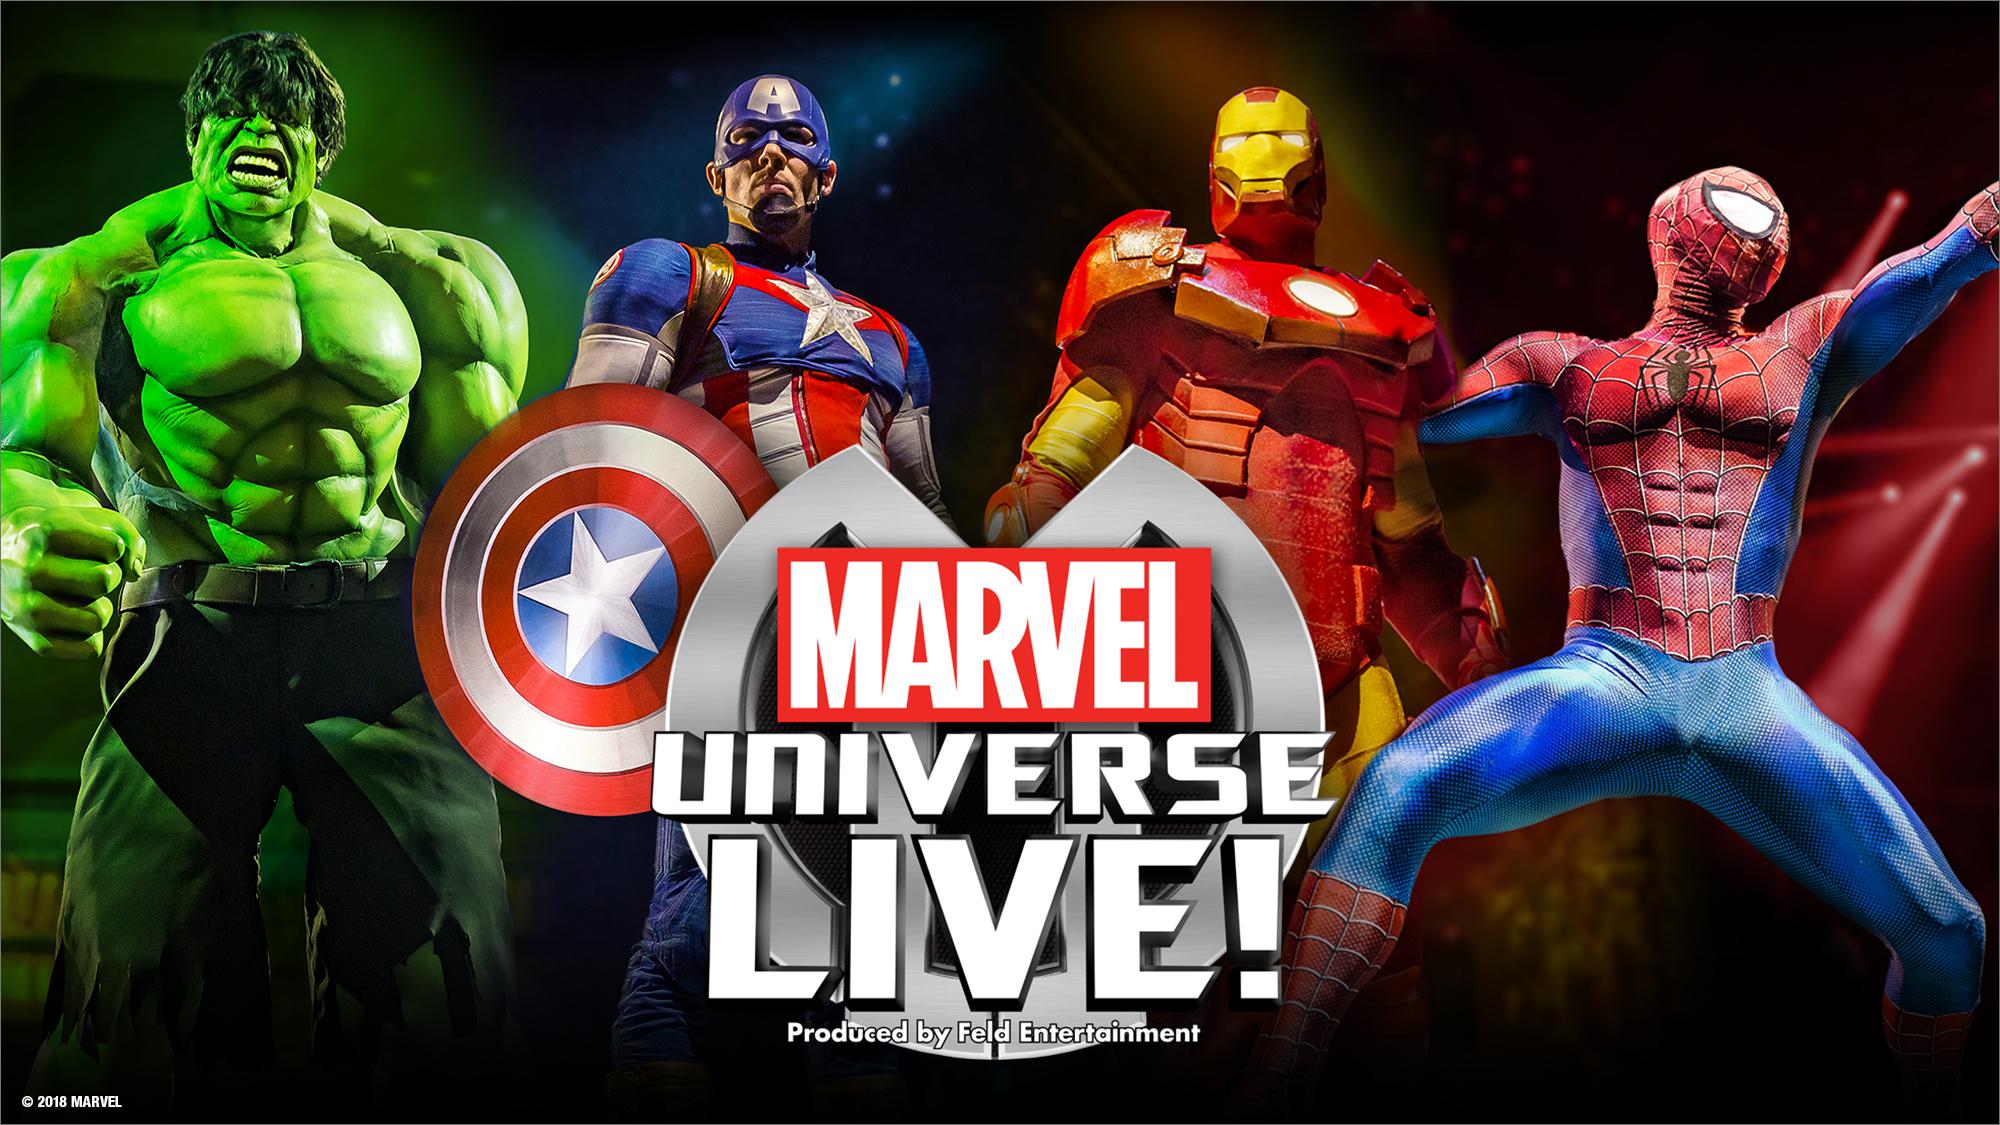 https://www.google.com/url?sa=i&source=images&cd=&ved=2ahUKEwiQ-qzm2NngAhWGneAKHW1BBu4QjRx6BAgBEAU&url=https%3A%2F%2Futerwincenter.com%2Fnews%2F2018%2F5%2F4%2Fevent-marvel-universe-live-age-of-heroes.aspx&psig=AOvVaw0F-AH-Ce6BBbgOY_VOCYQJ&ust=1551280623755683